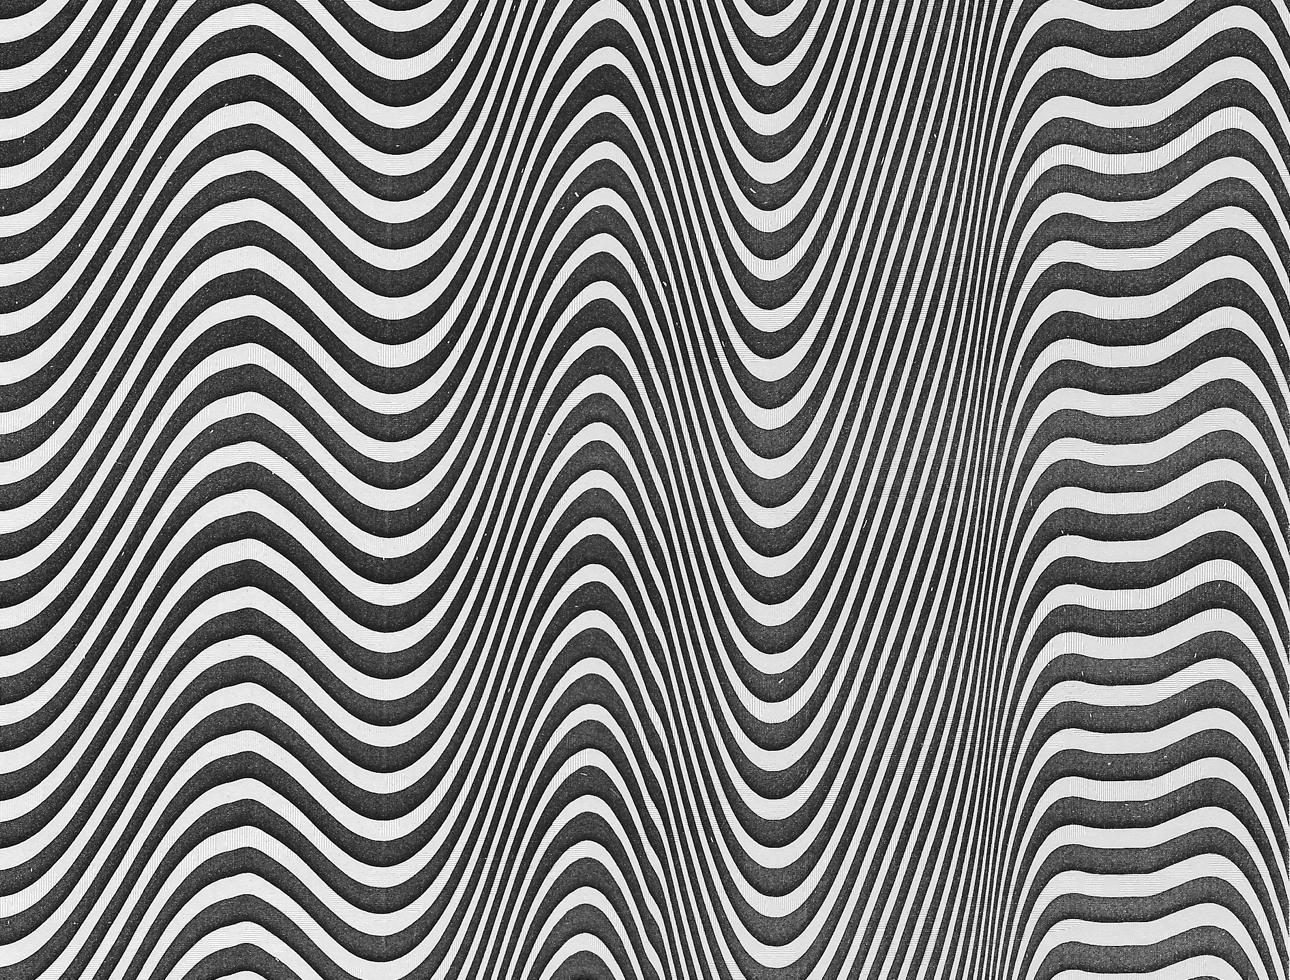 chadkouri-thumb-xerographymonoprints-chicagodesignmuseum